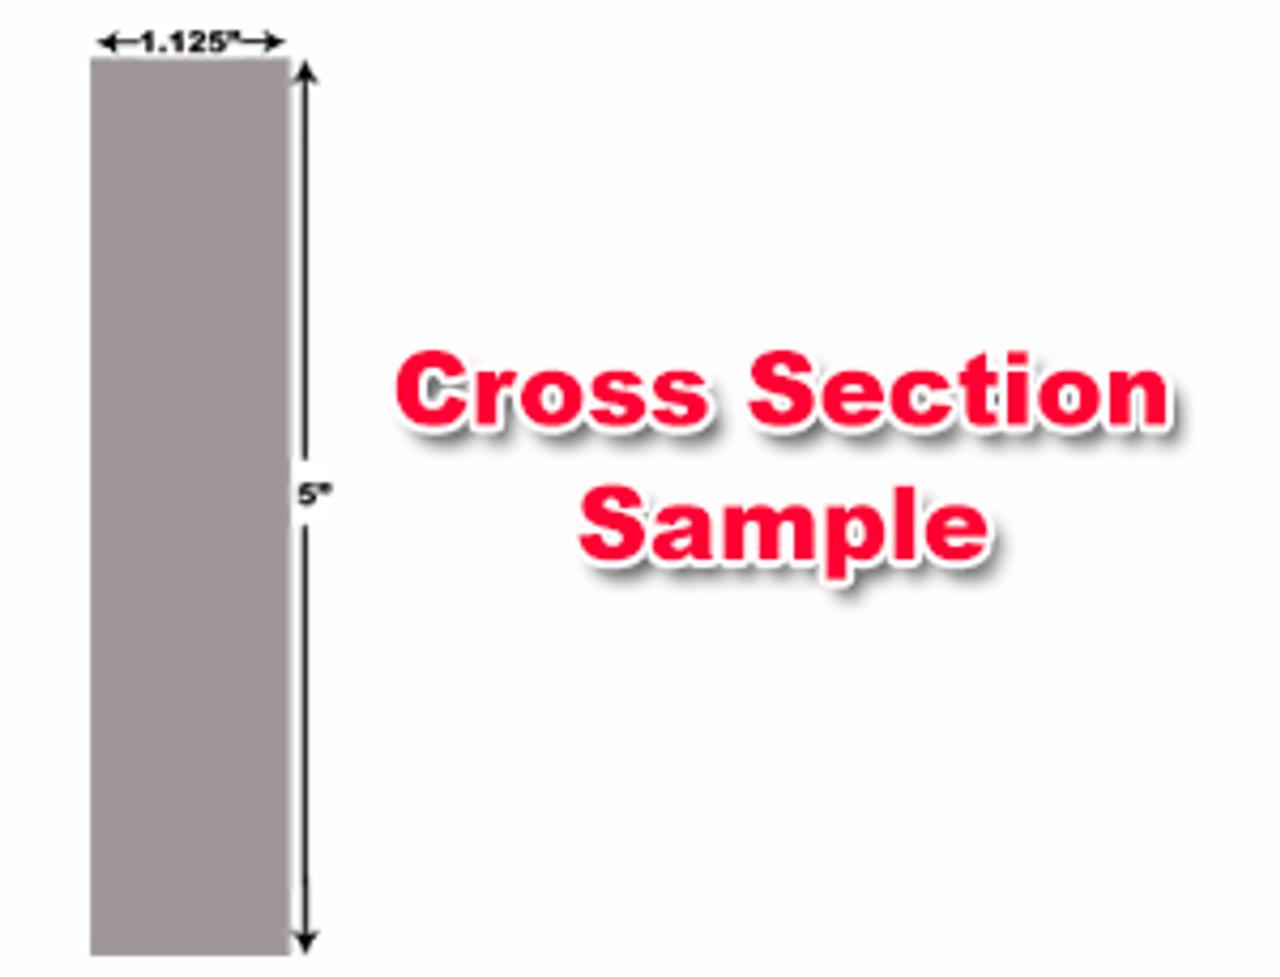 "American Hercules Shear Knives - 148"" Length, 5"" x 1.125"" Cross Section (239246) Type C"